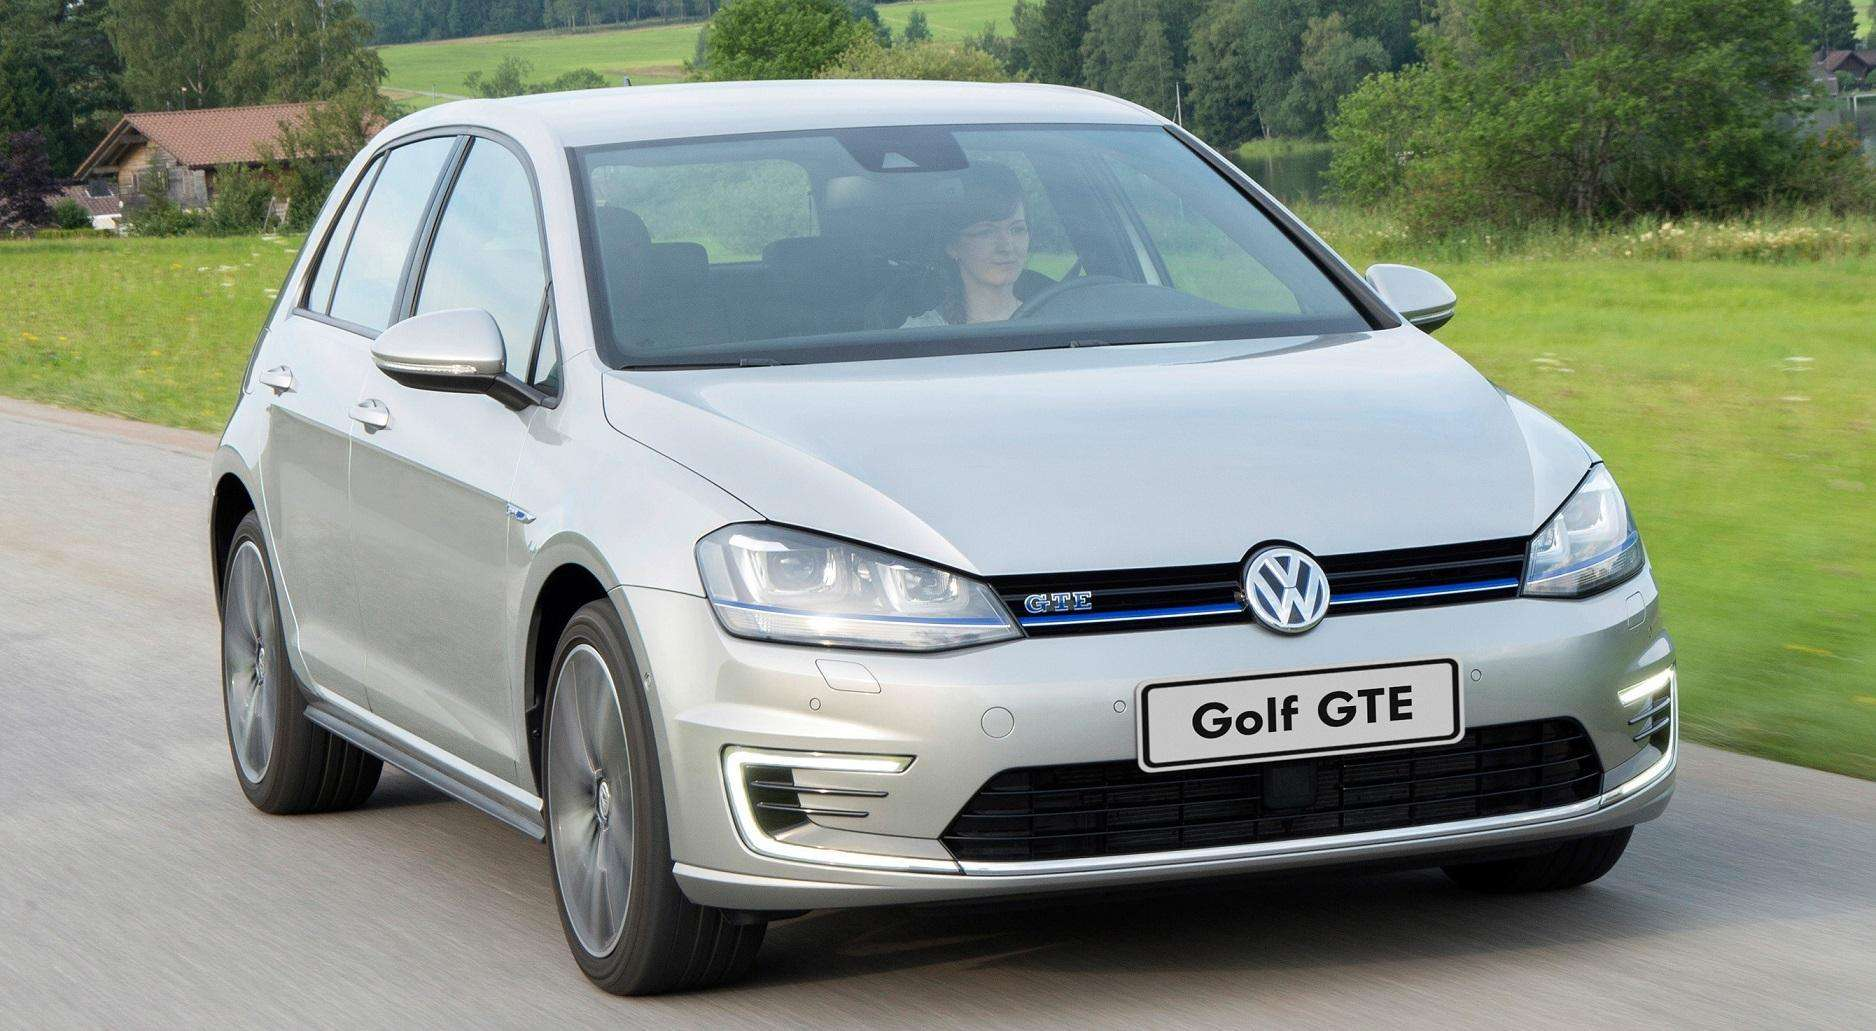 Volkswagen apoia o 24º Simpósio Internacional de Engenharia Automotiva